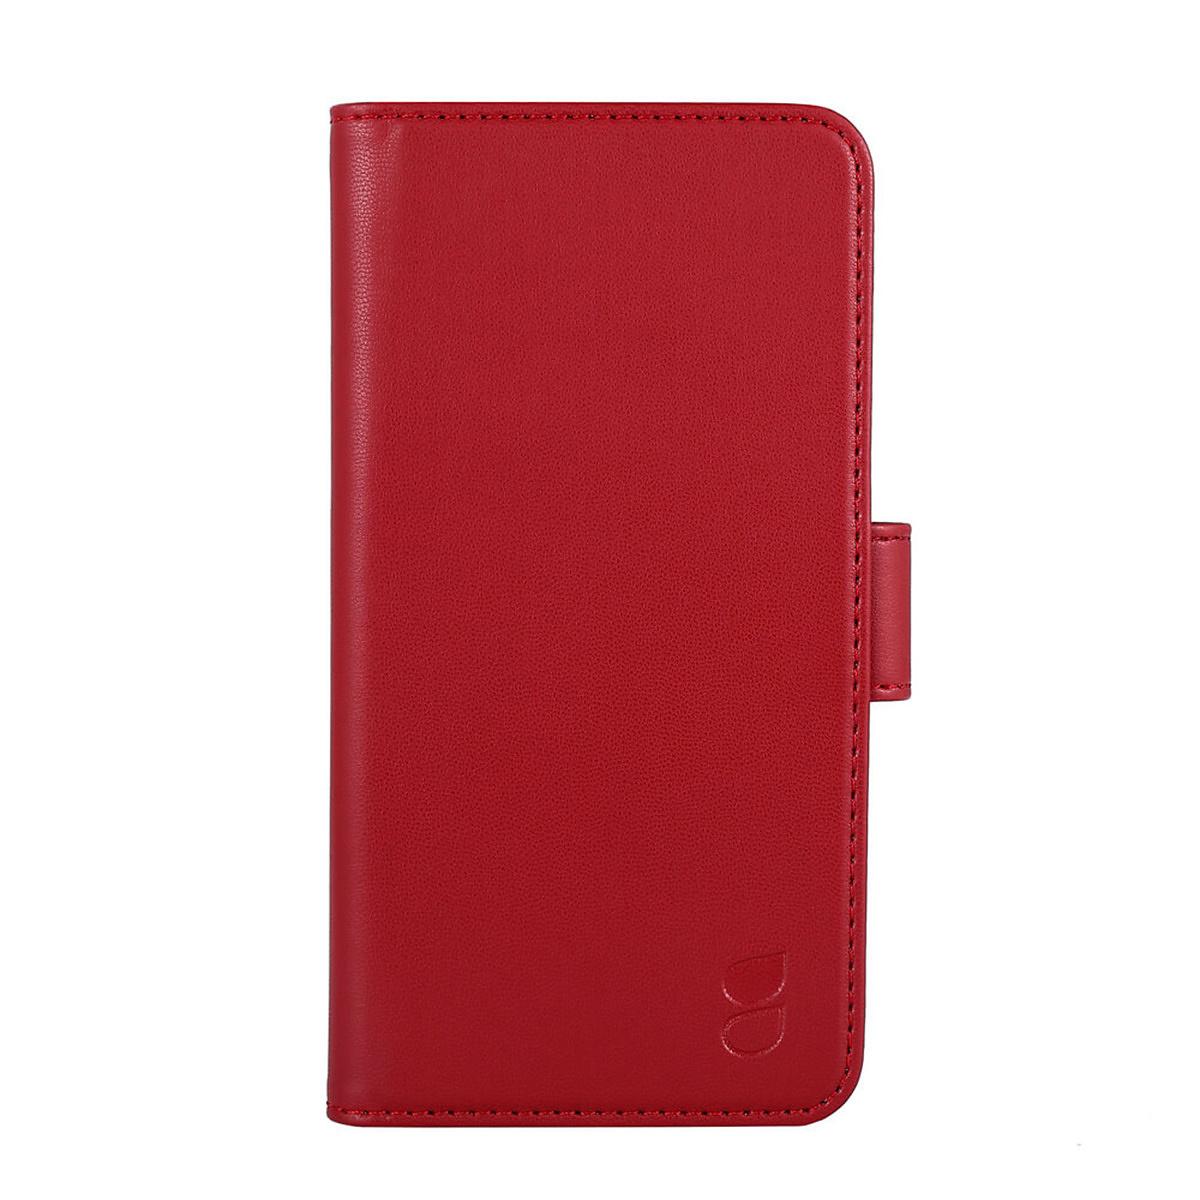 Gear plånboksväska, Limited Edition, iPhone 11 Pro, röd